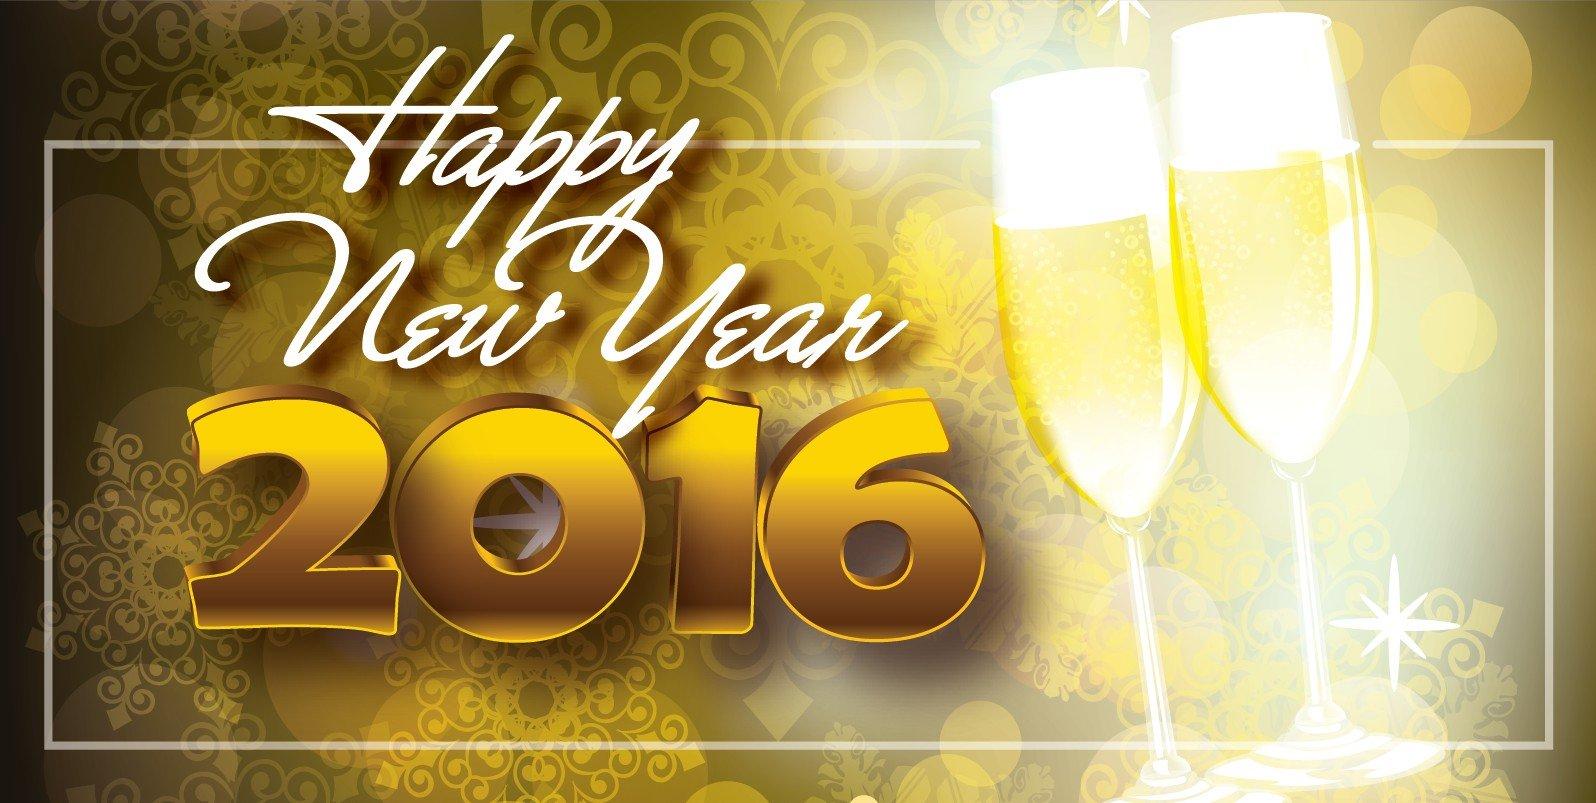 New Years '15 Web Image